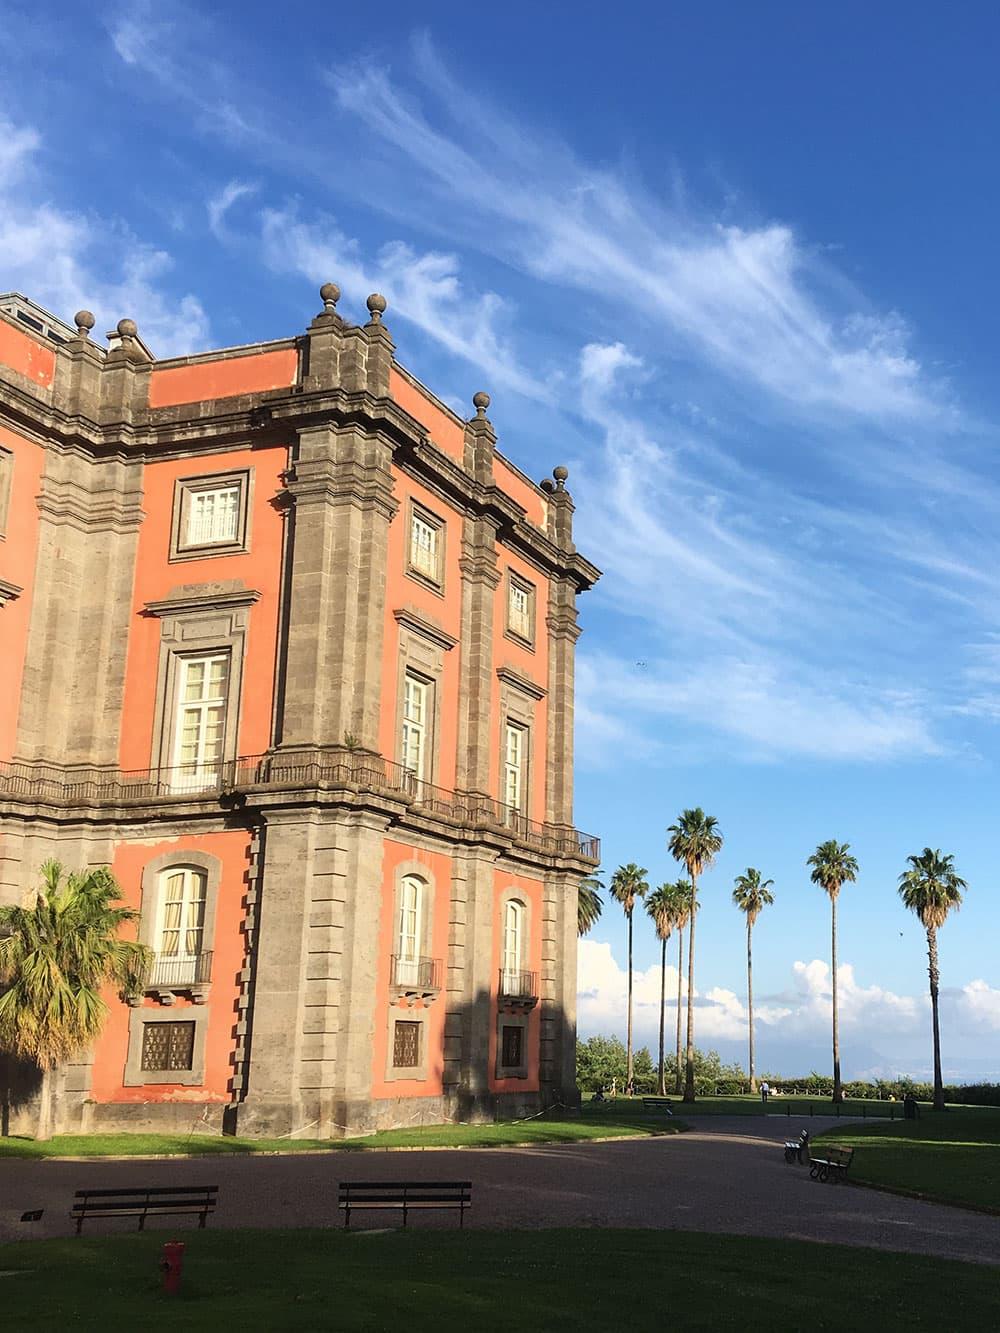 Capodimonte Museum & Royal Park in Naples